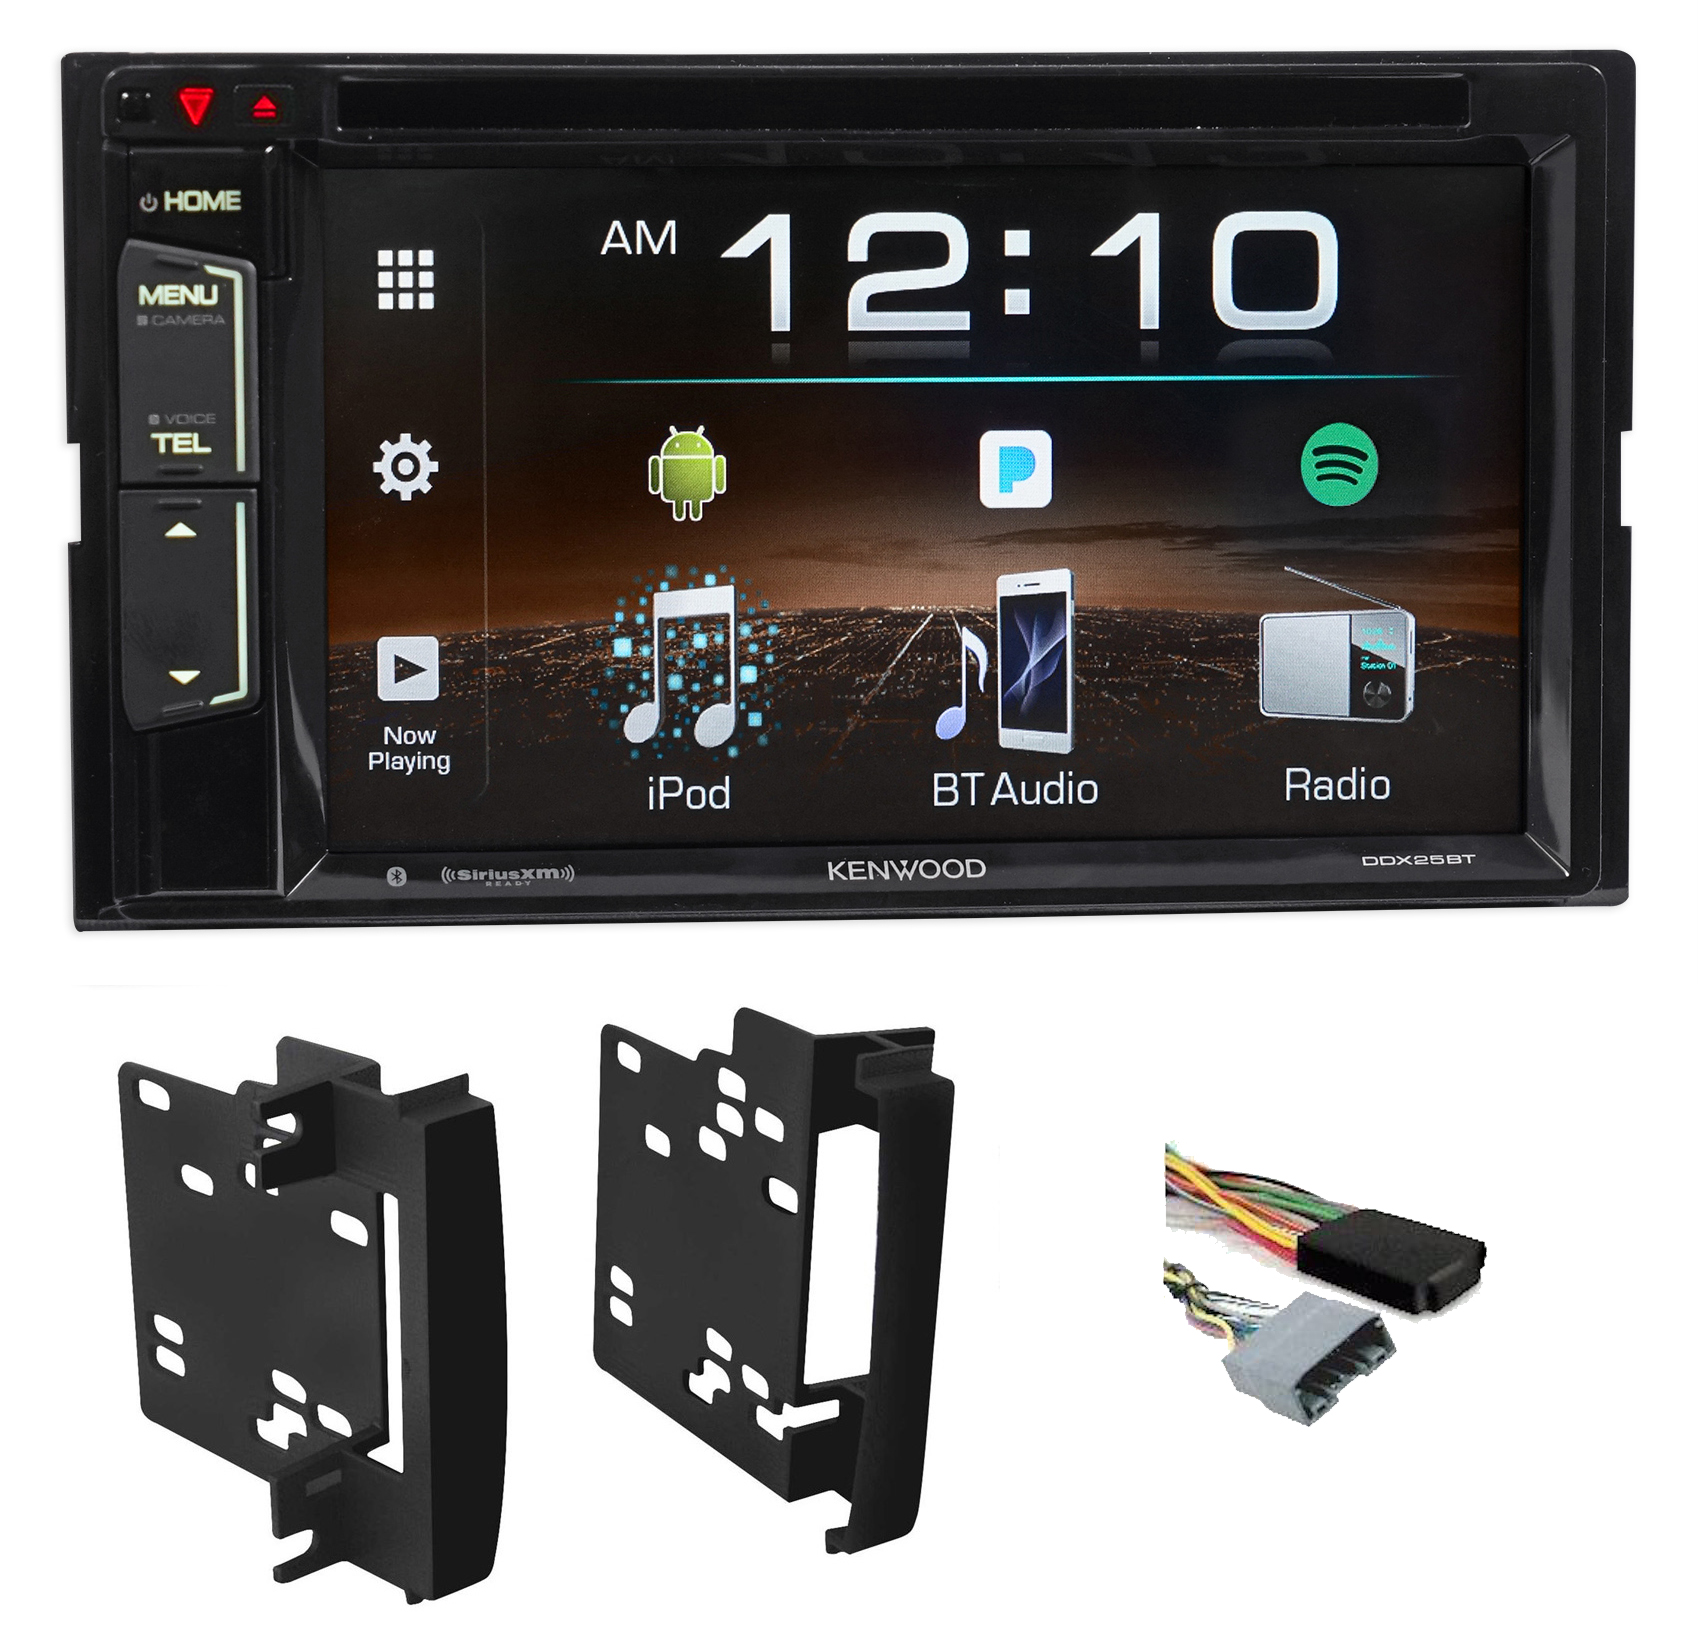 2007-2009 Jeep Wrangler Kenwood Car DVD iPhone Bluetooth Pandora USB Receiver by Kenwood